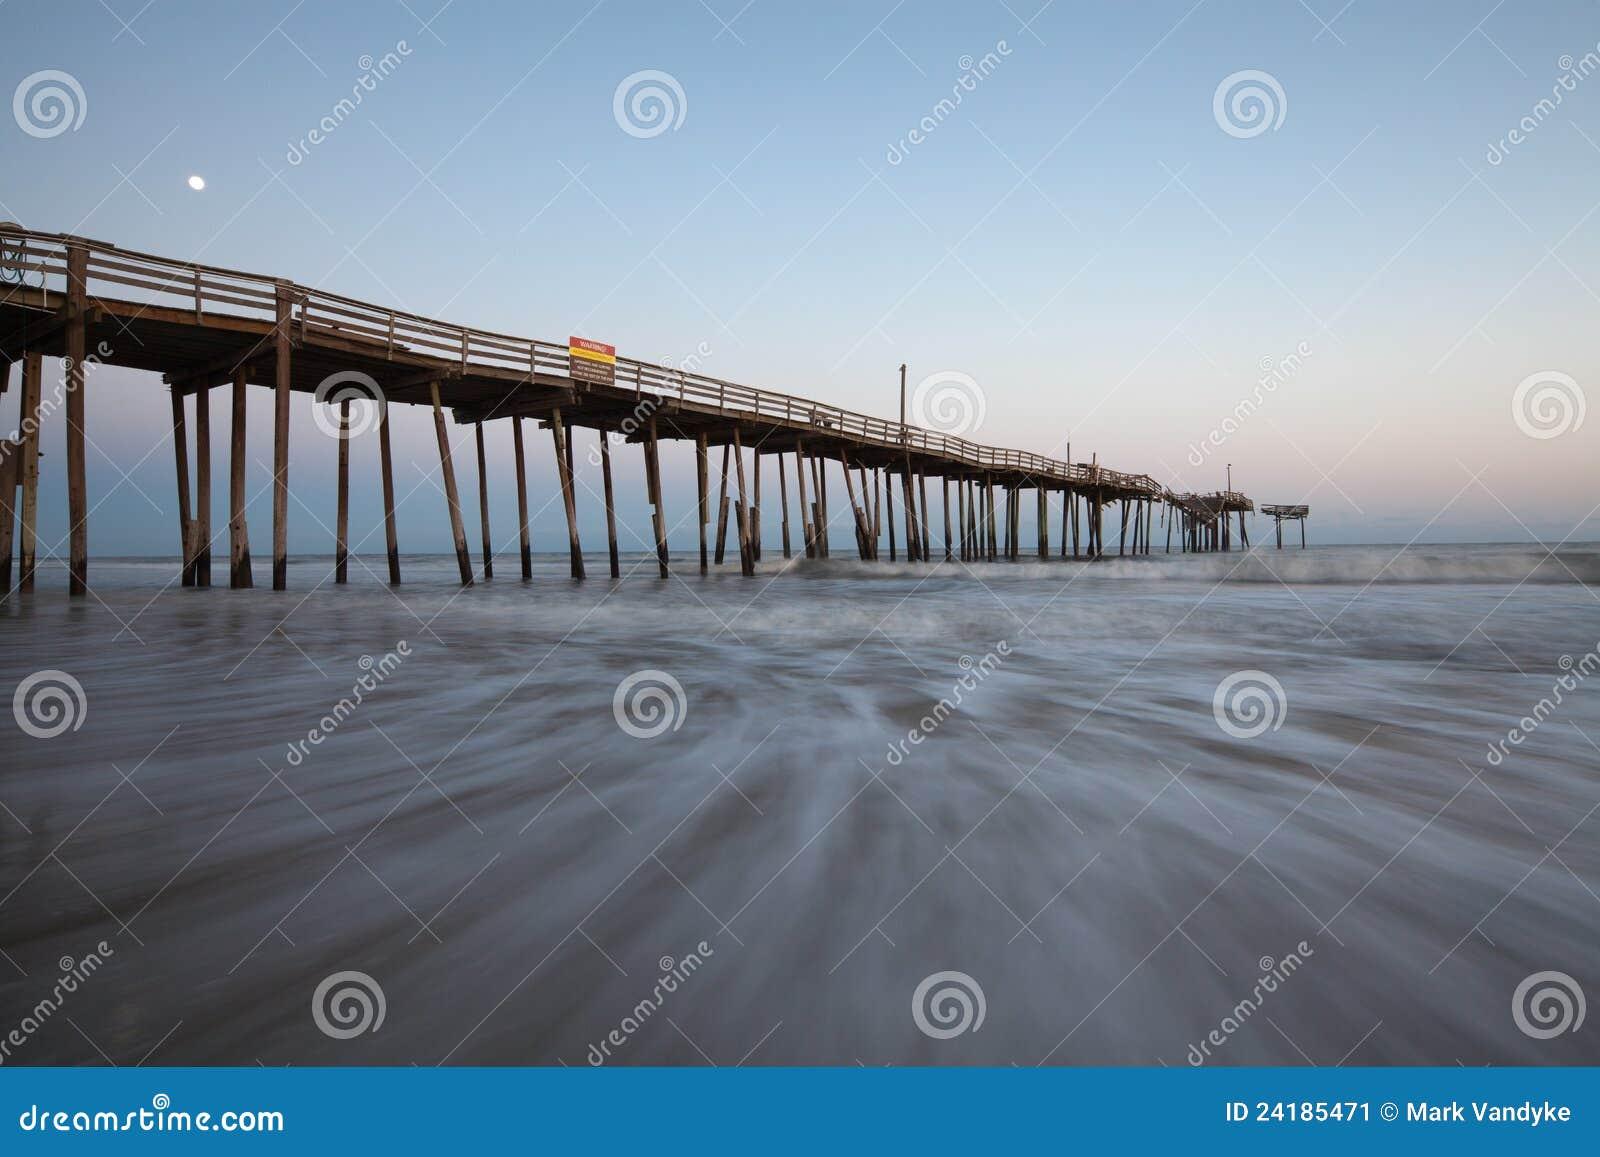 North carolina fishing pier obx moonlight stock image for Nc fishing piers